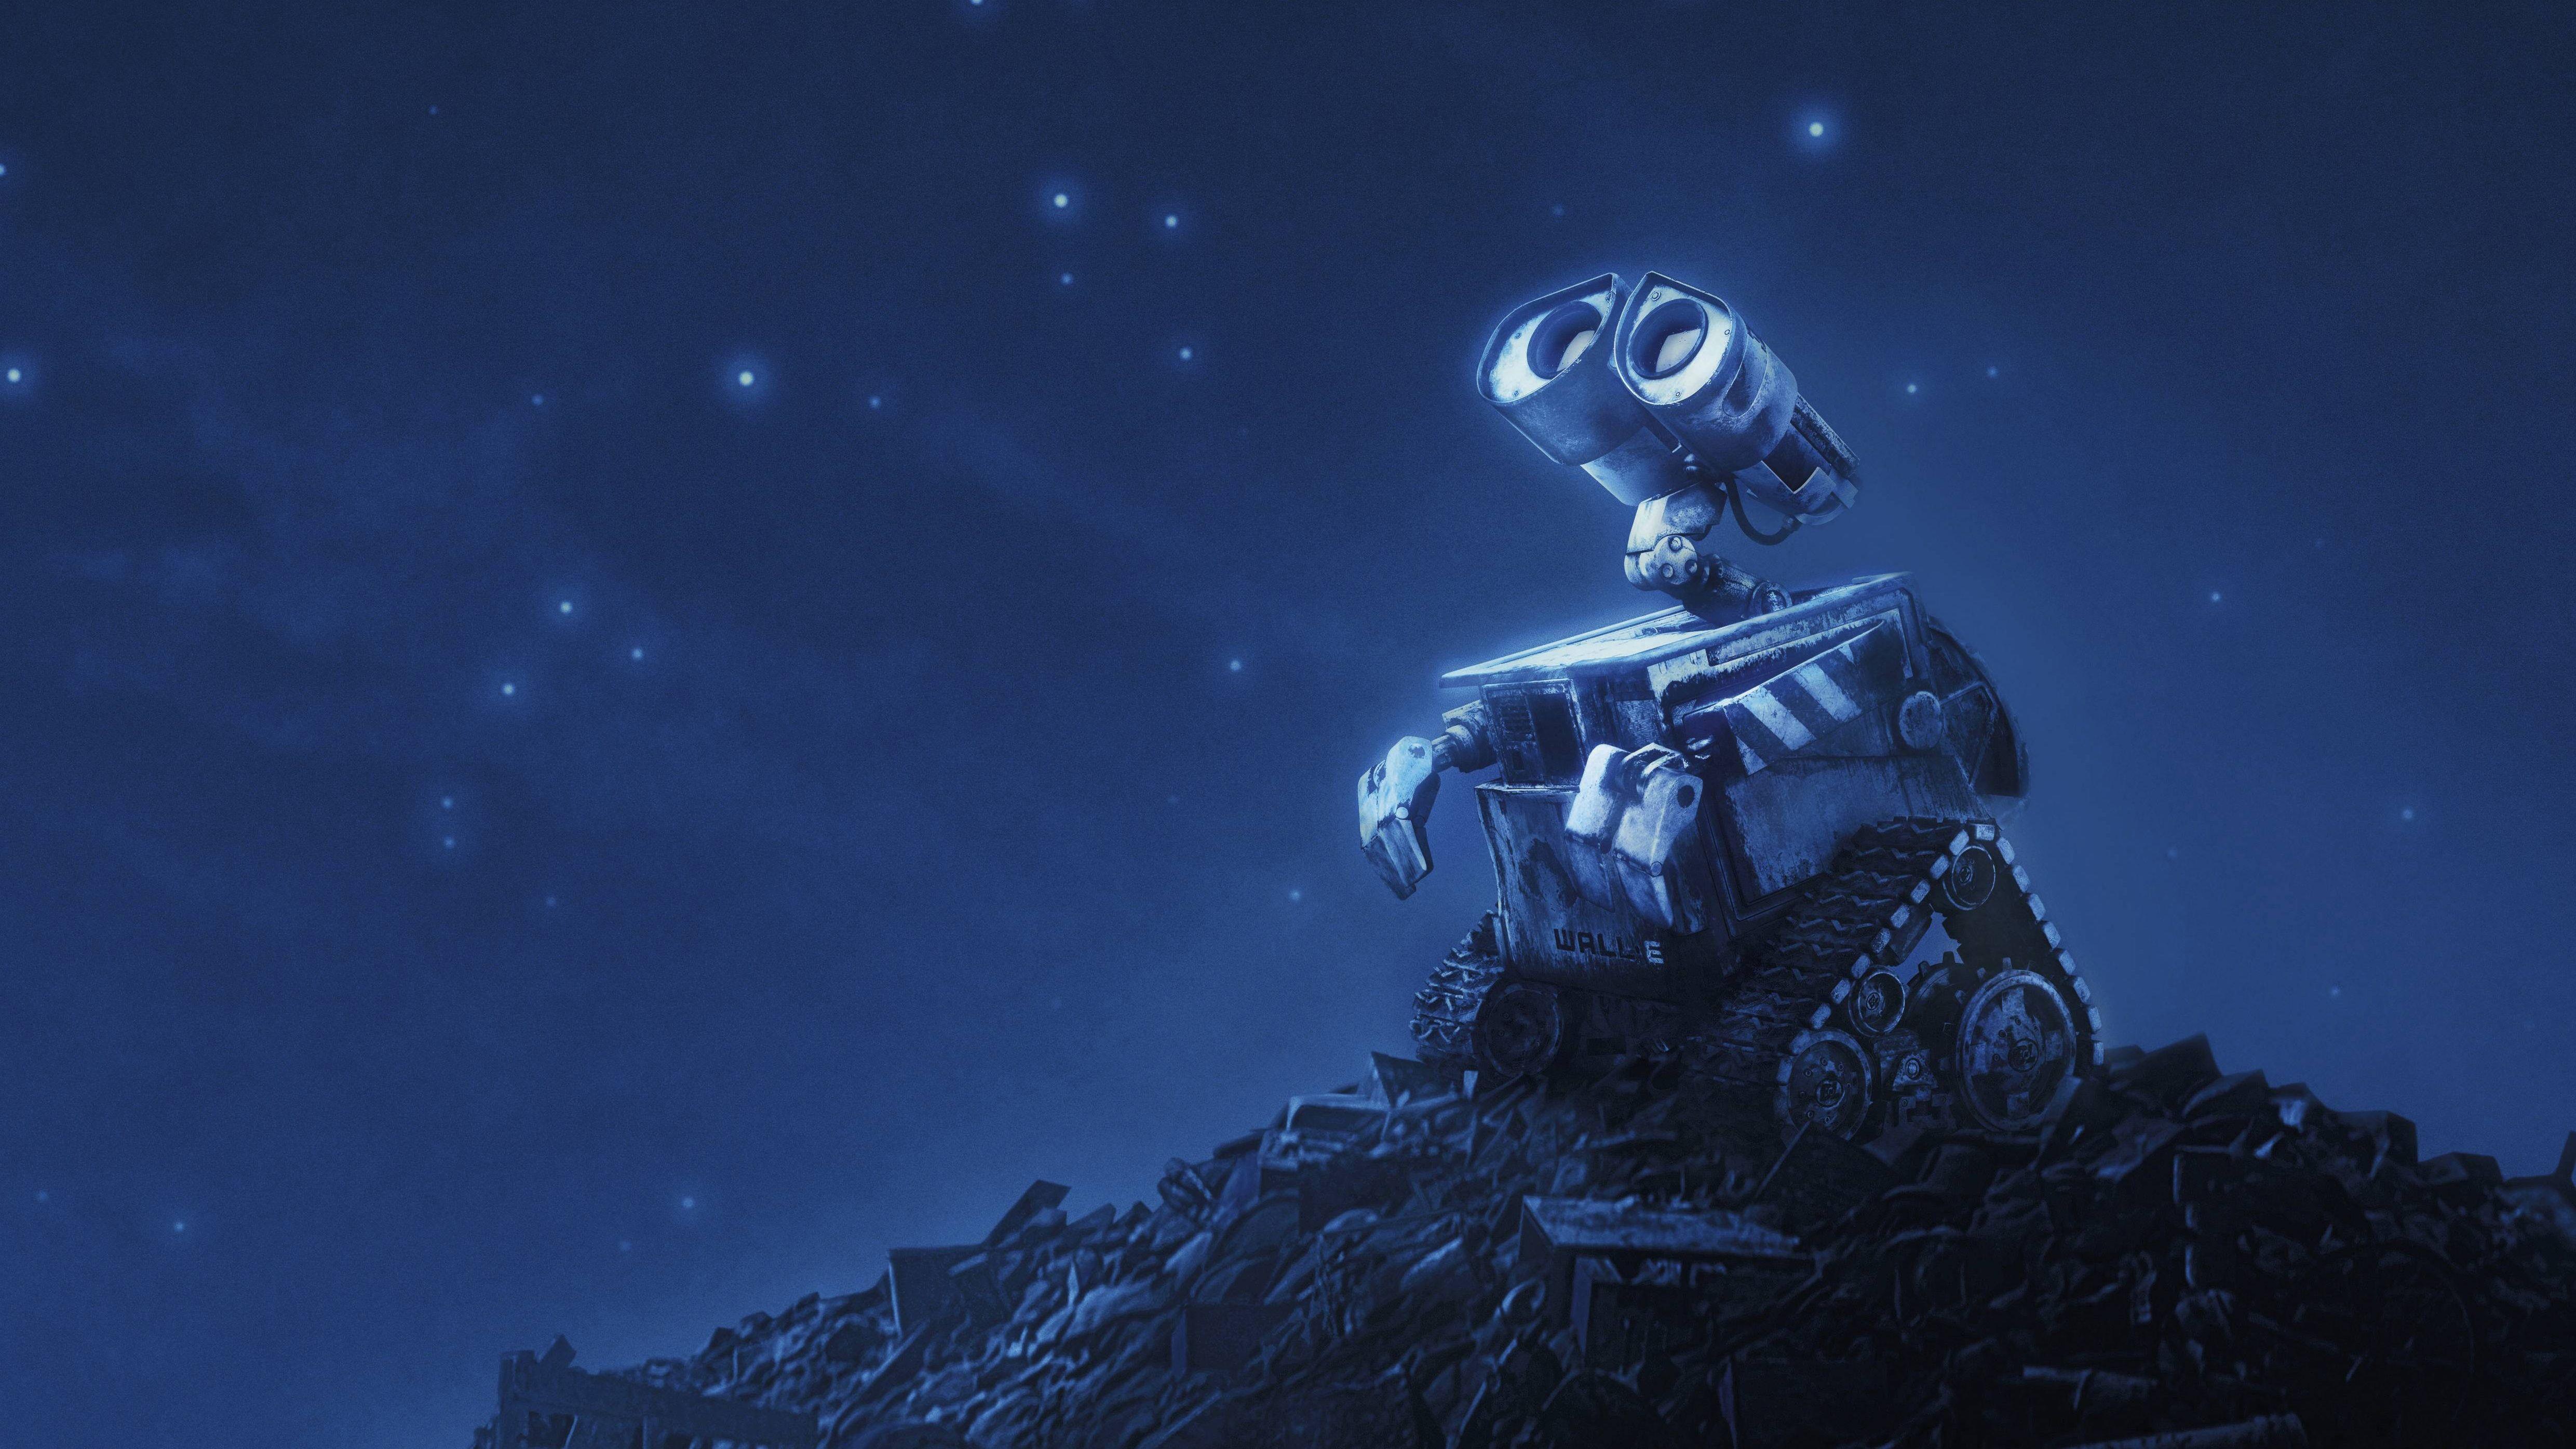 How To Give Robot Characters Life Wall E Wall E Movie Wall E Animation Movie